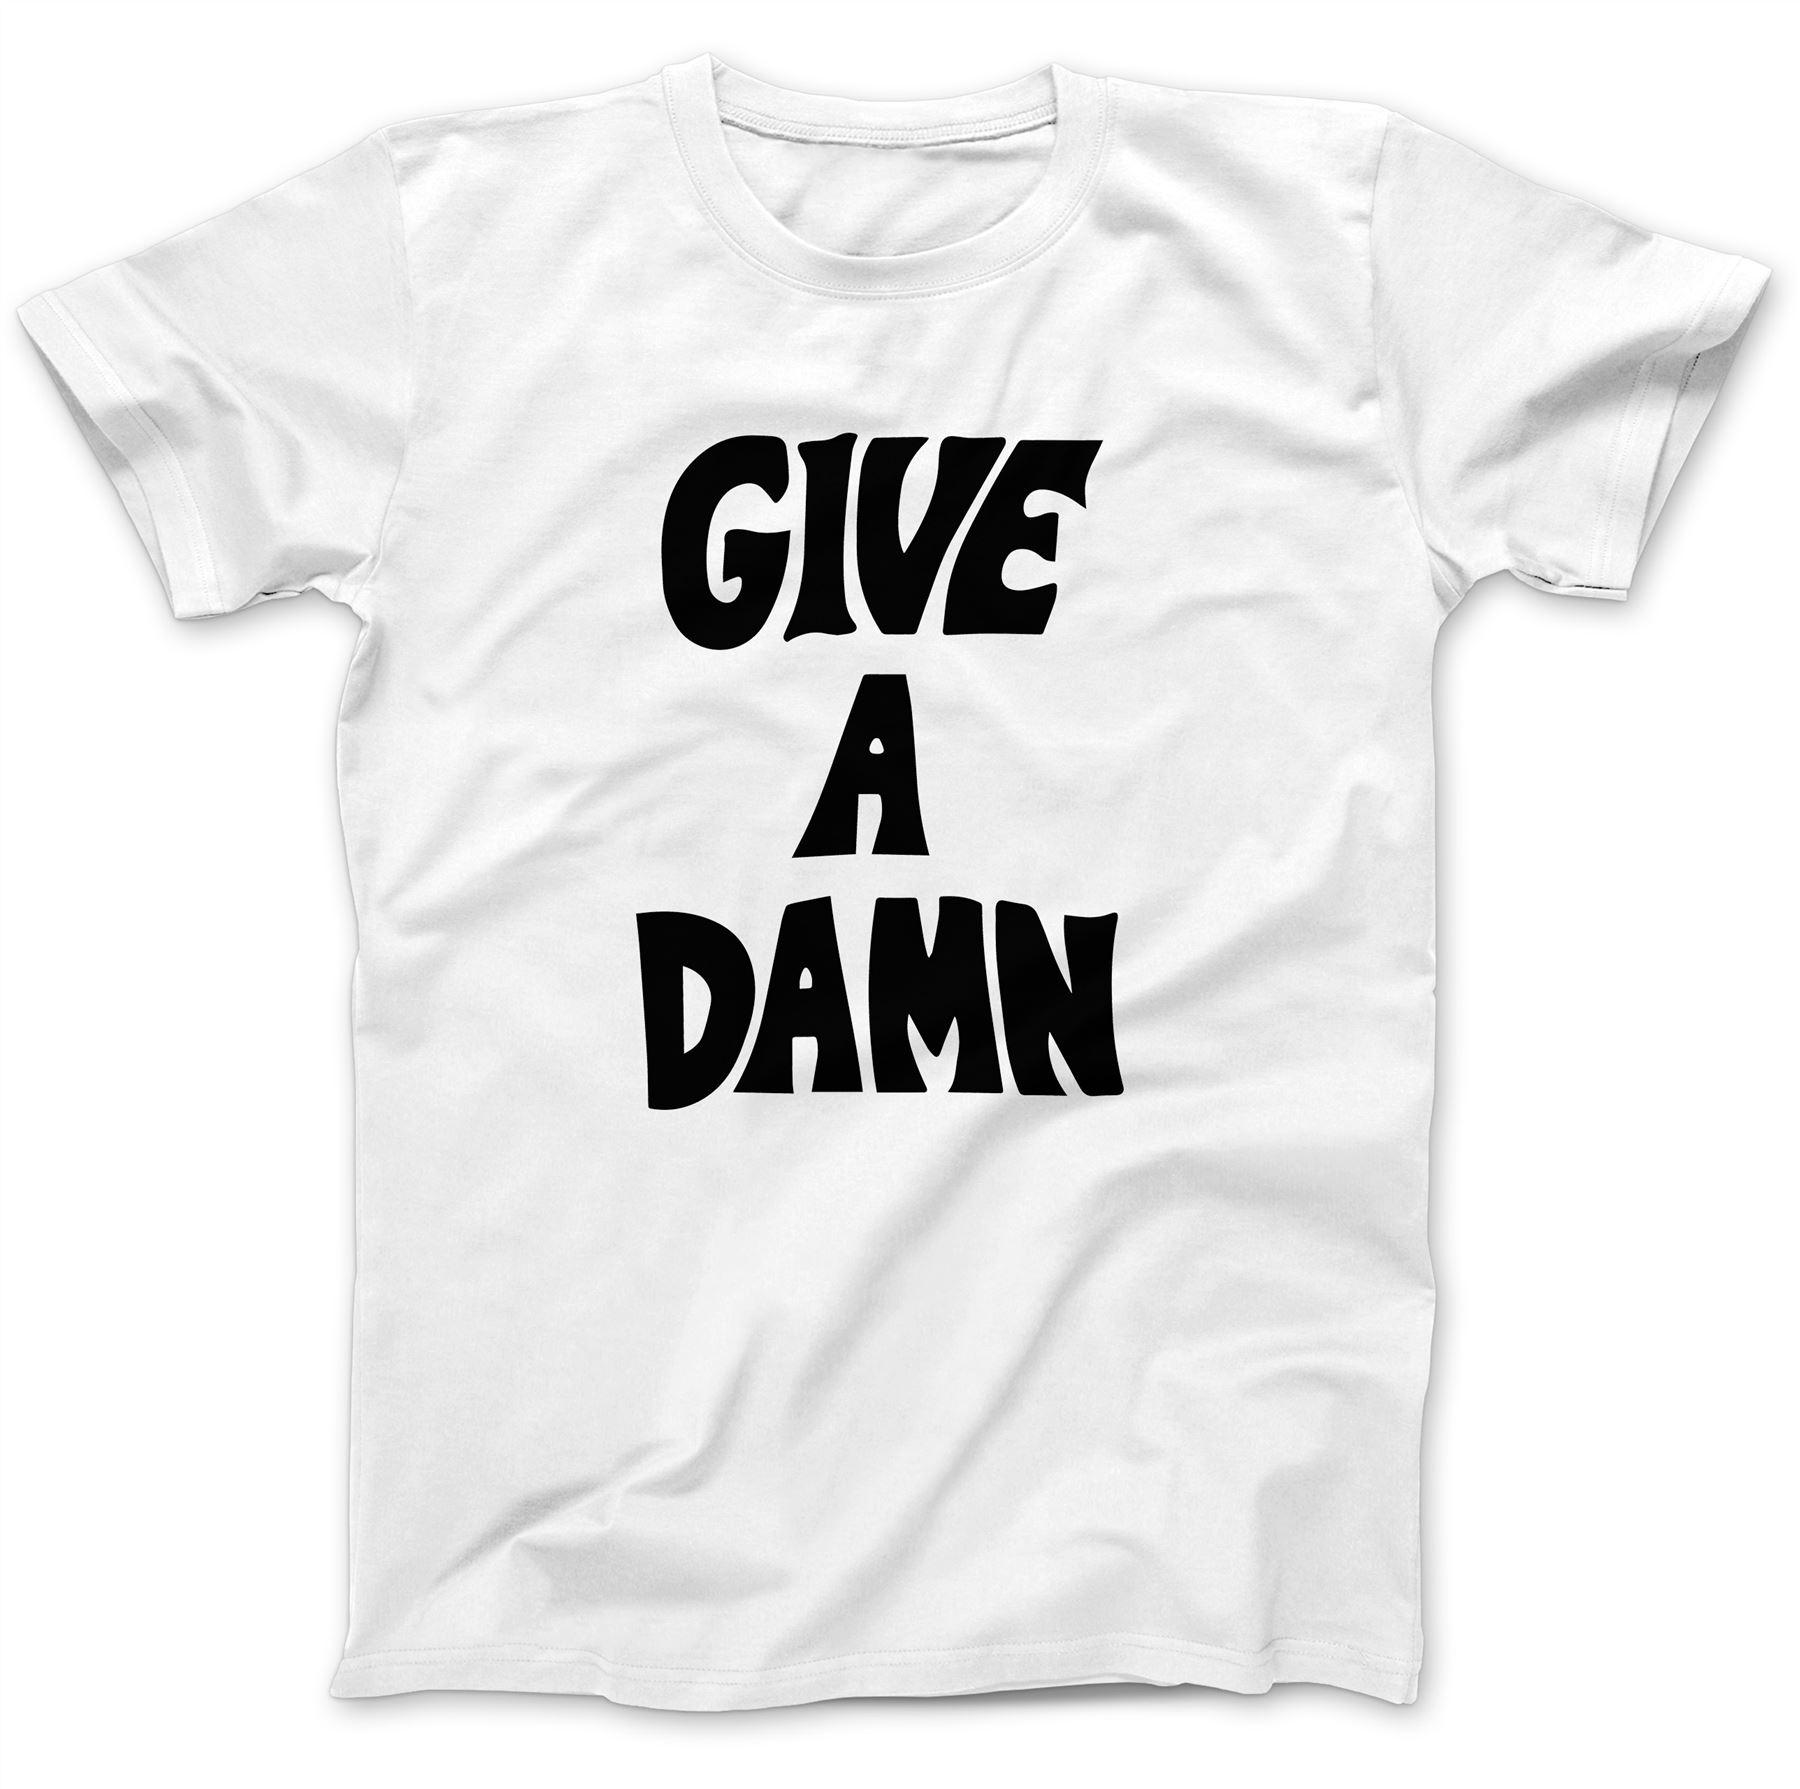 Give-A-Damn-As-Worn-By-Alex-Turner-T-Shirt-100-Premium-Cotton-Music-Gift miniatuur 10